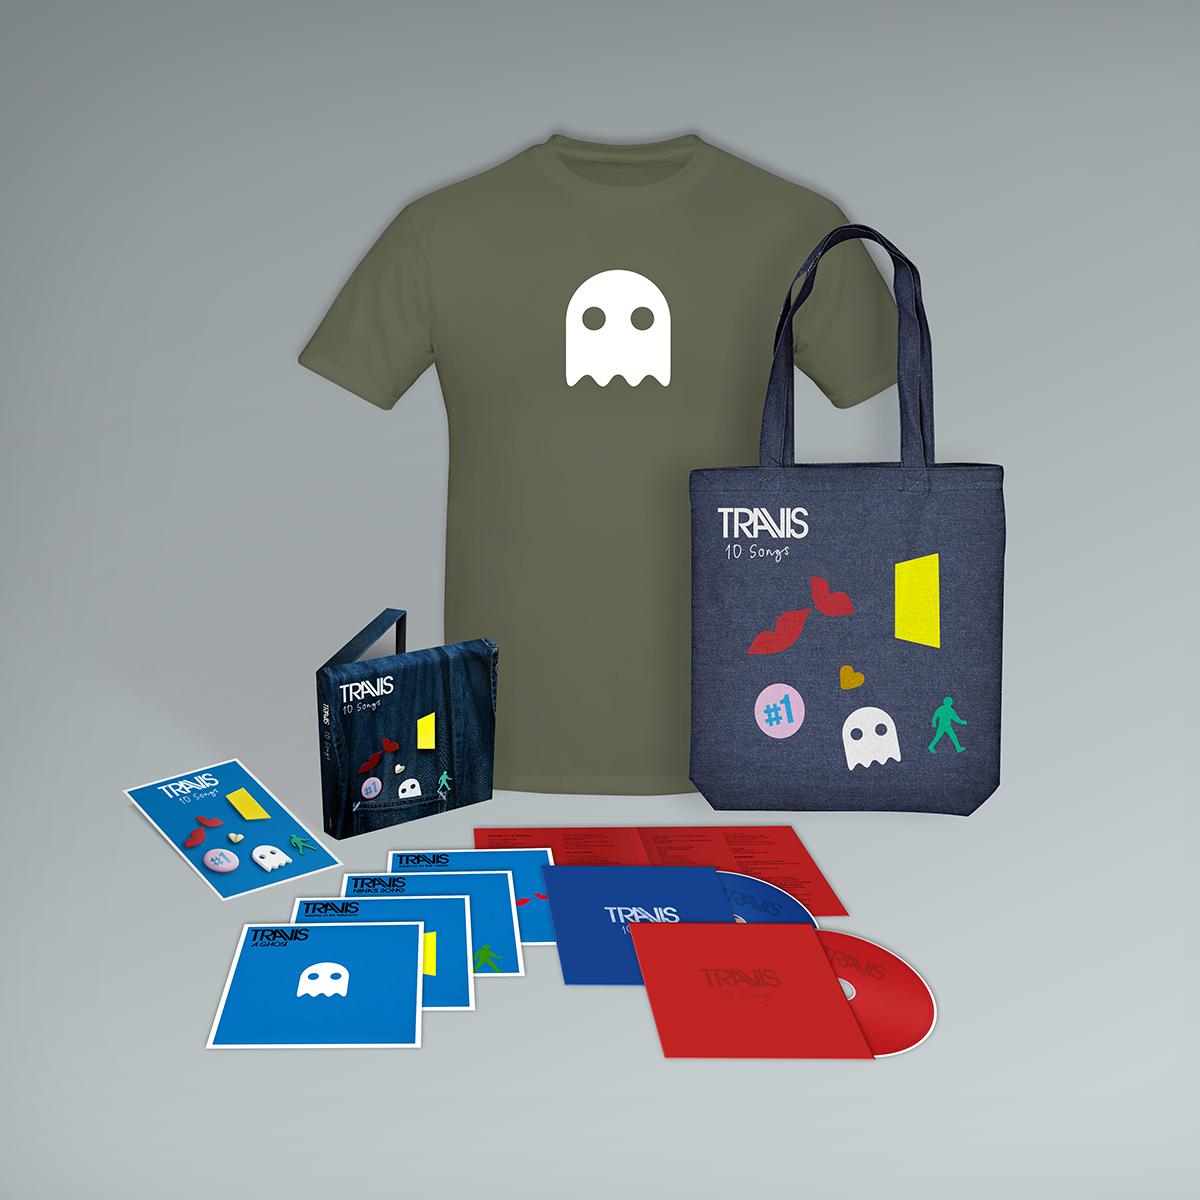 Buy Online Travis - 10 Songs Deluxe Double CD (Inc. Album Demos) + T-Shirt + Badge Set + Tote Bag